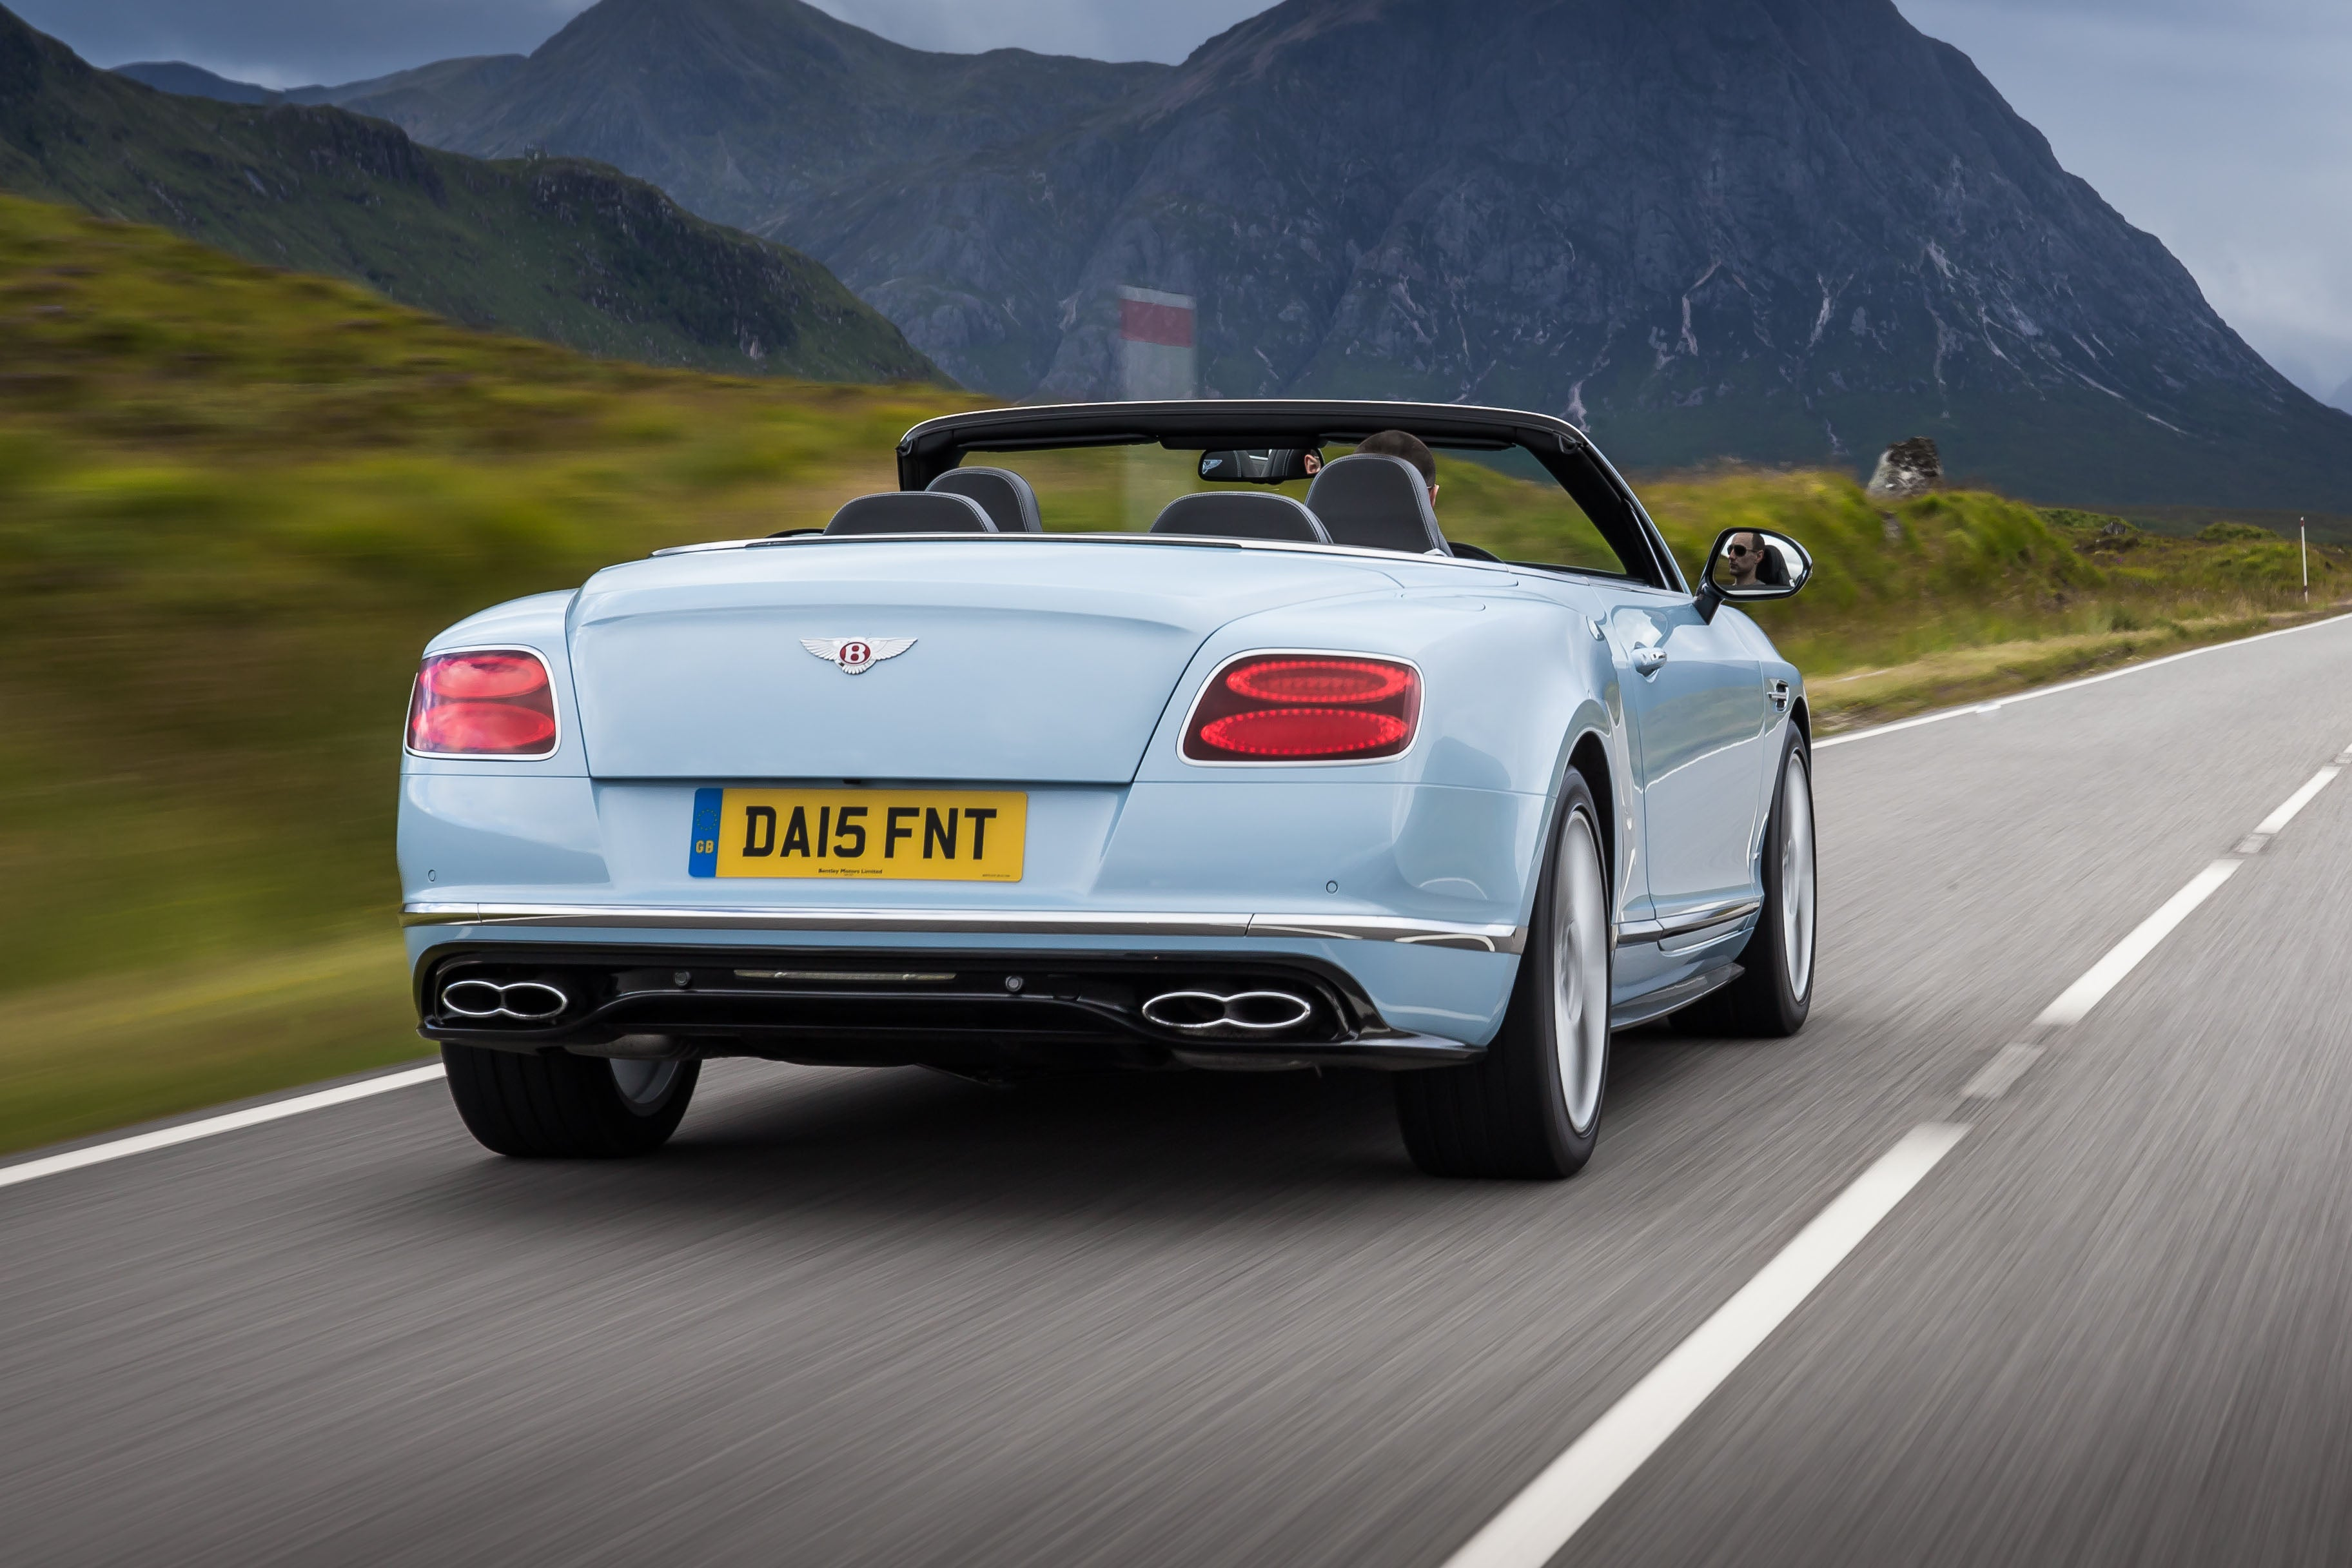 Bentley Continental GTC Driving Back